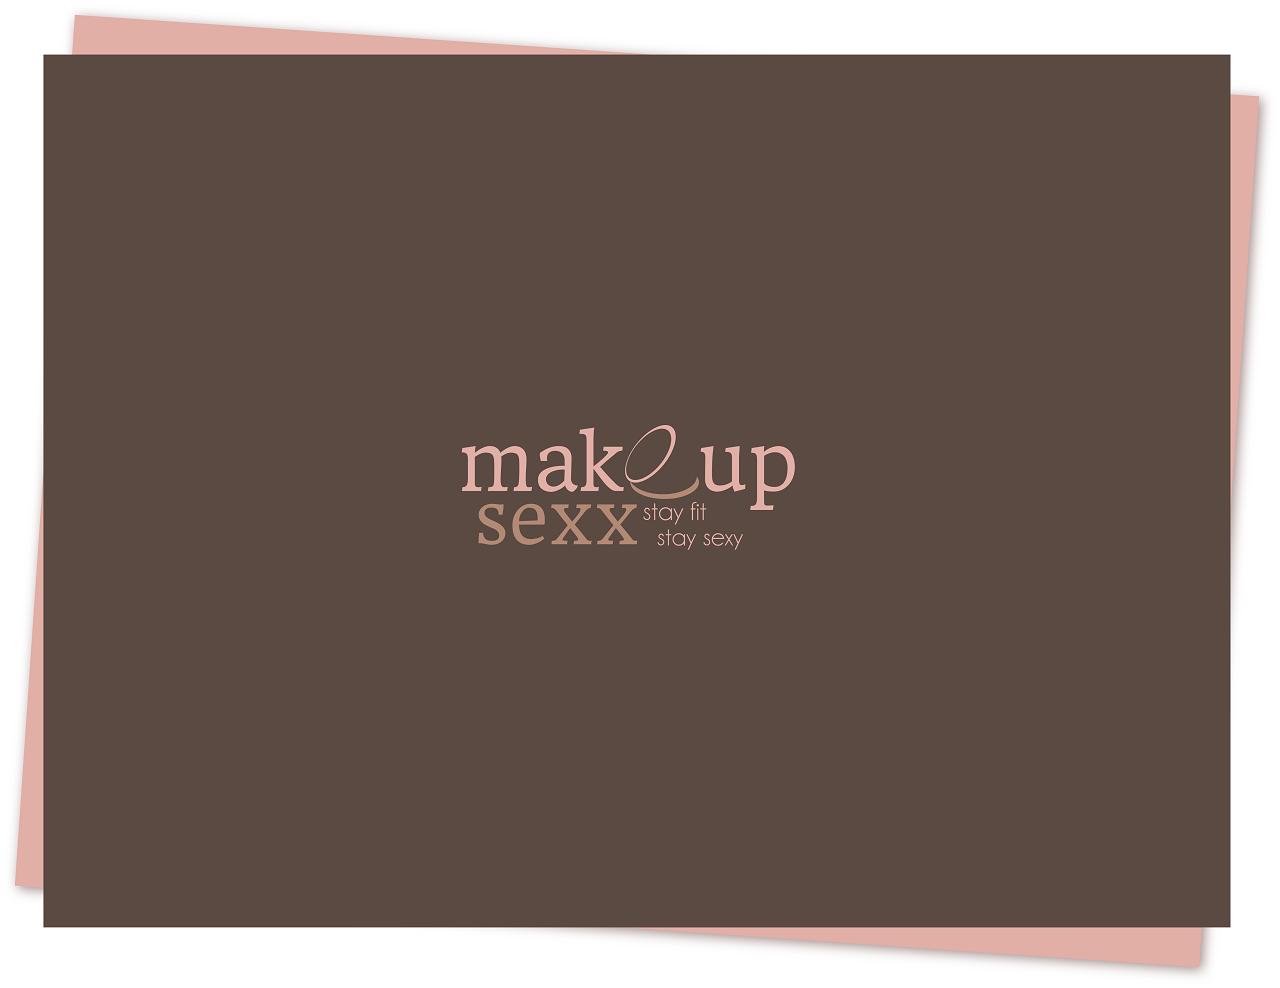 Help makeup sexx with a new logo